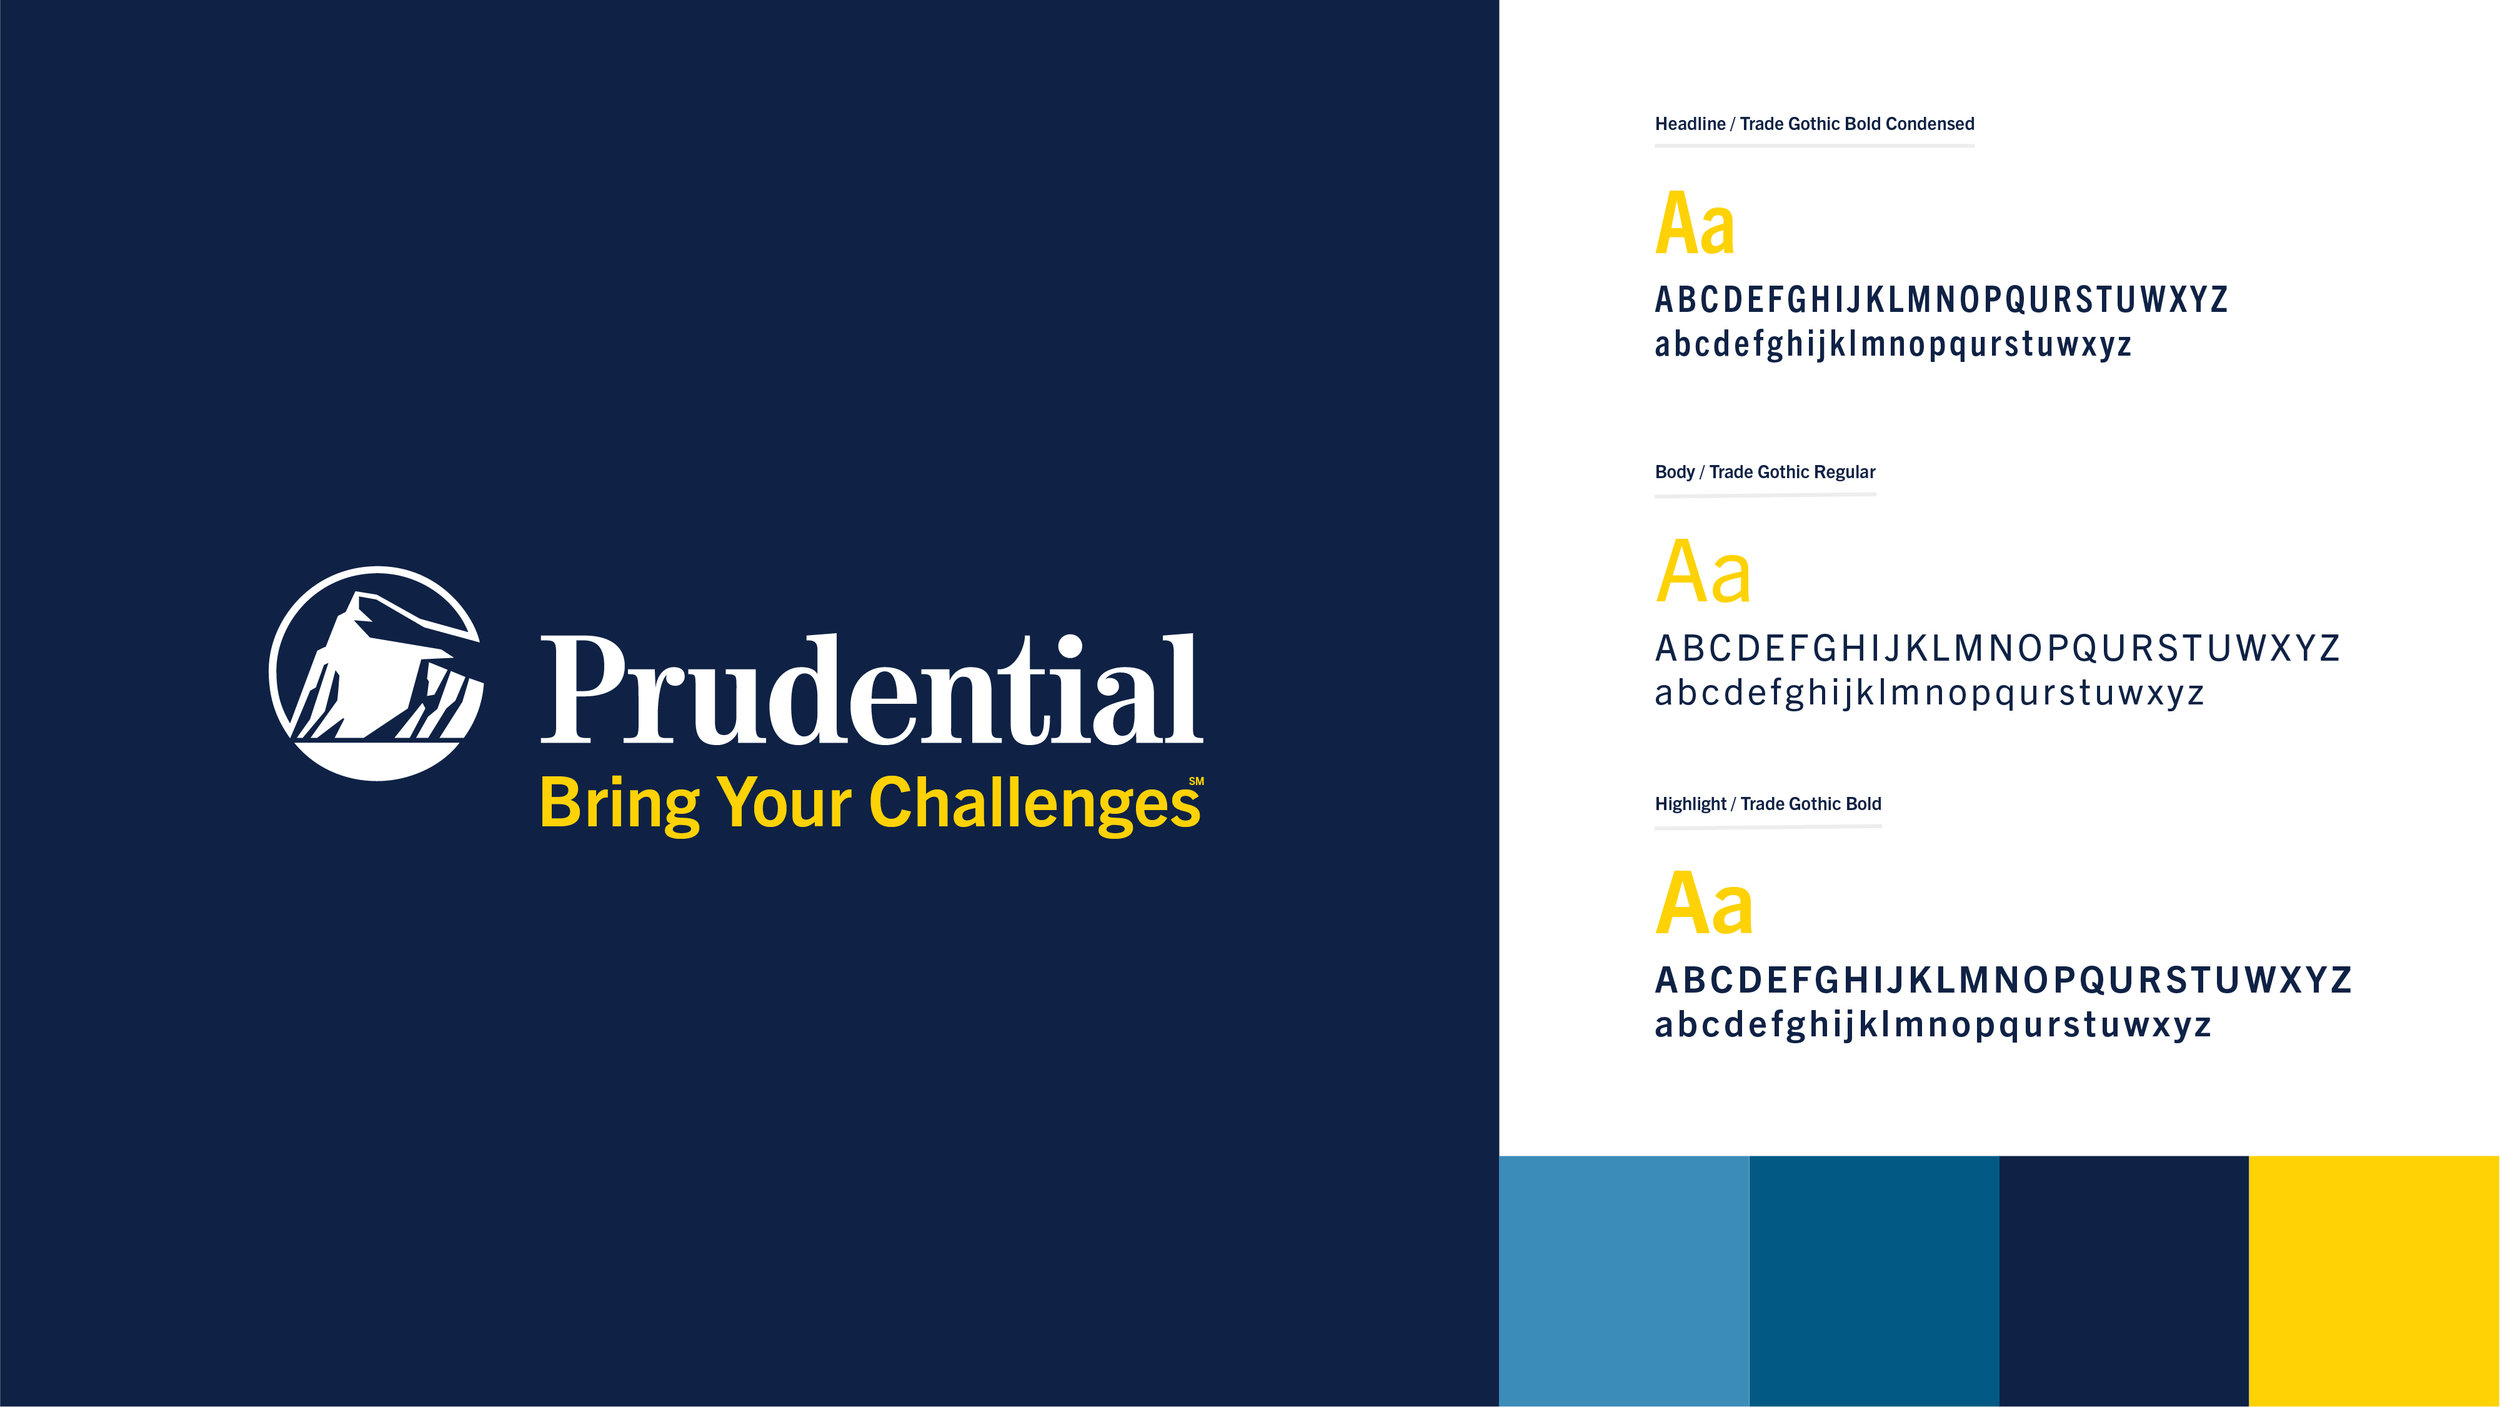 PrudentialRebrand-02.jpg